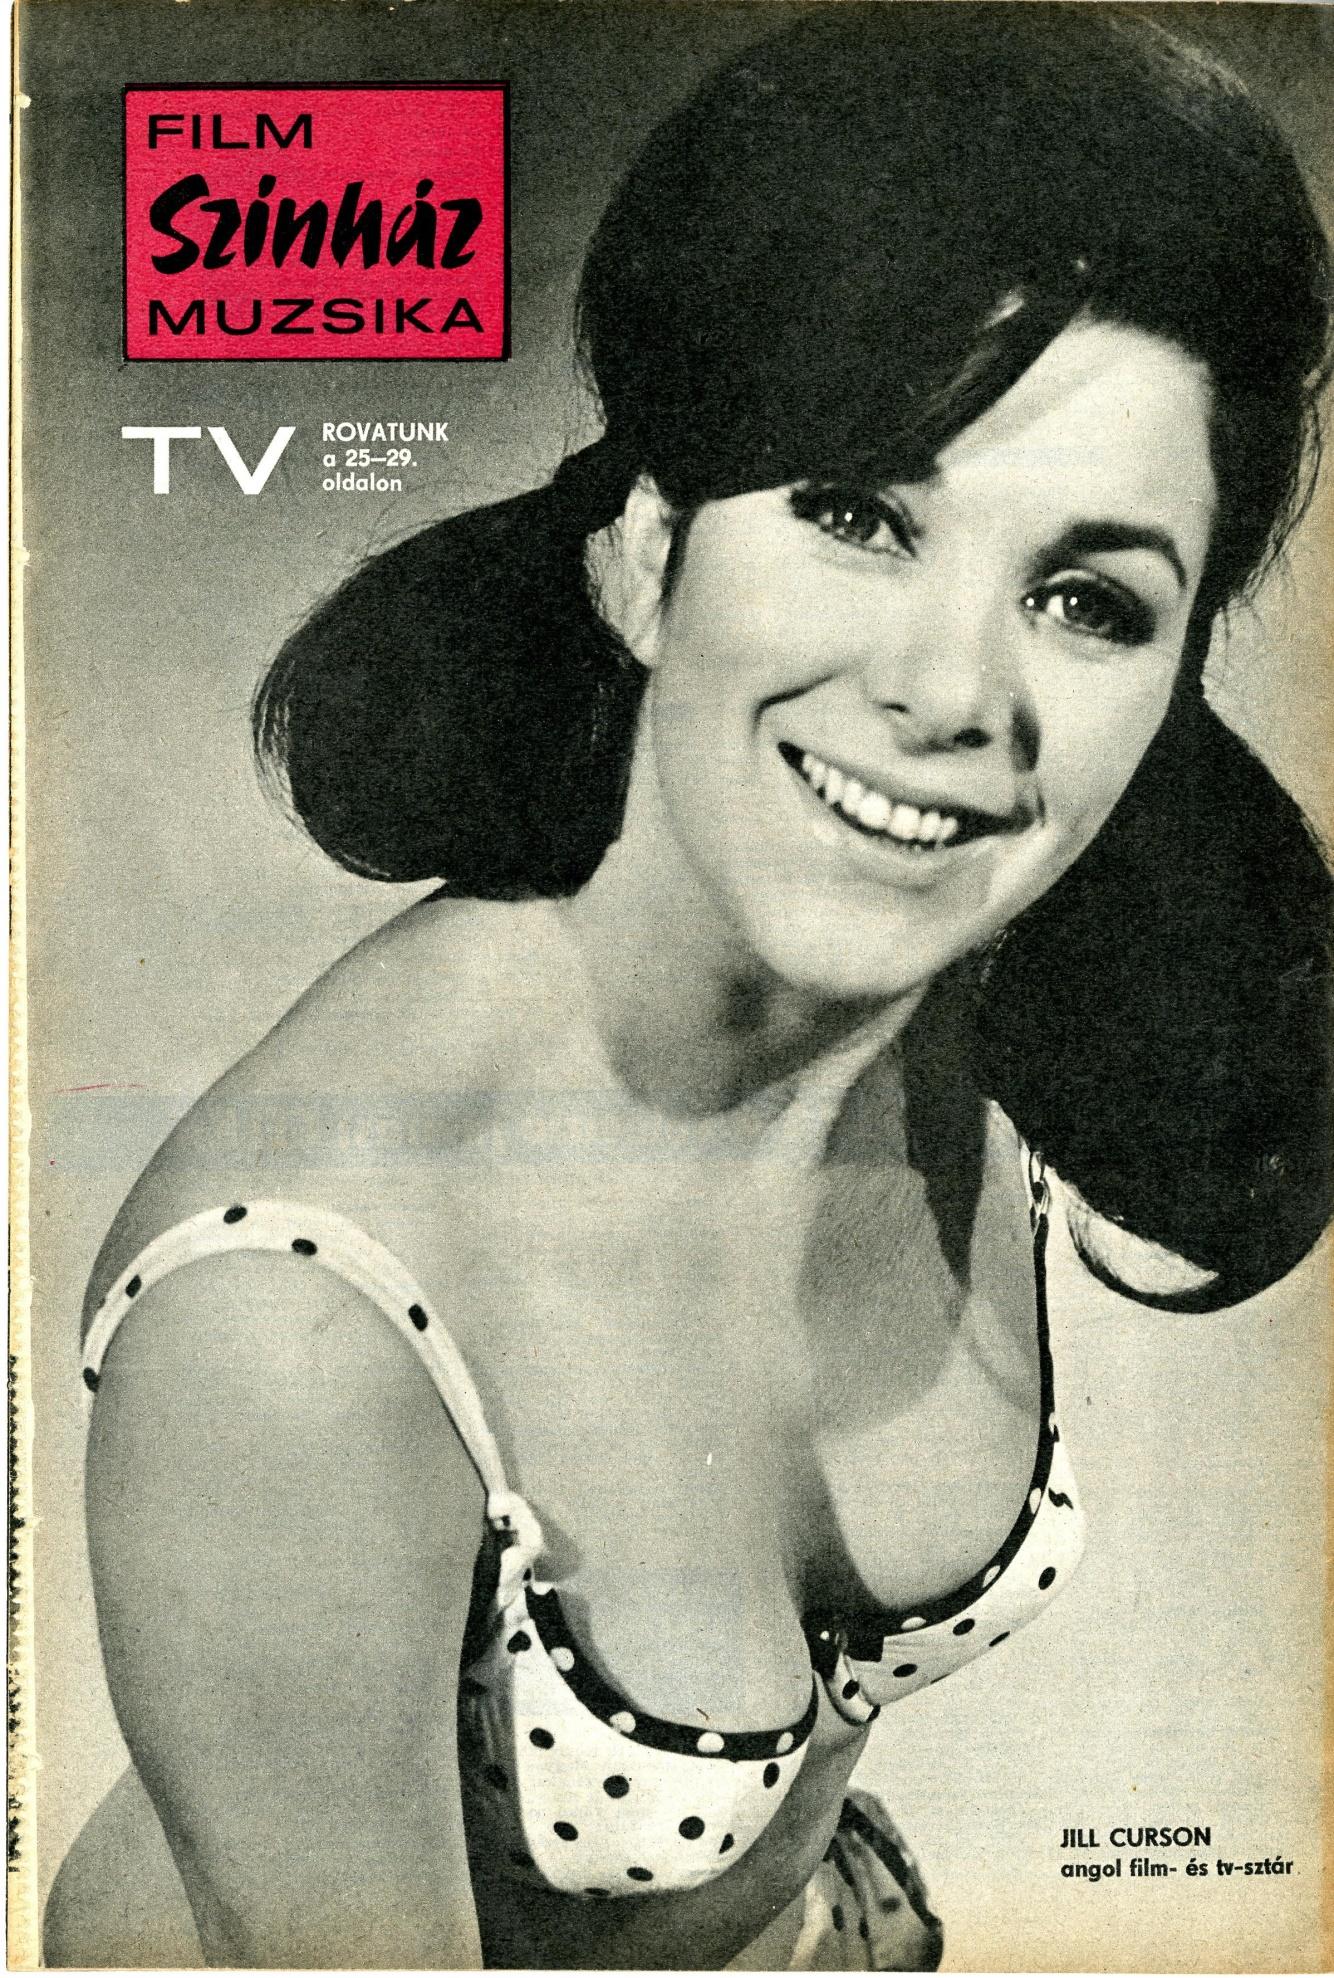 Jill Curzon in Szinhaz Film Muzsika (Hungary), 18 July 1970